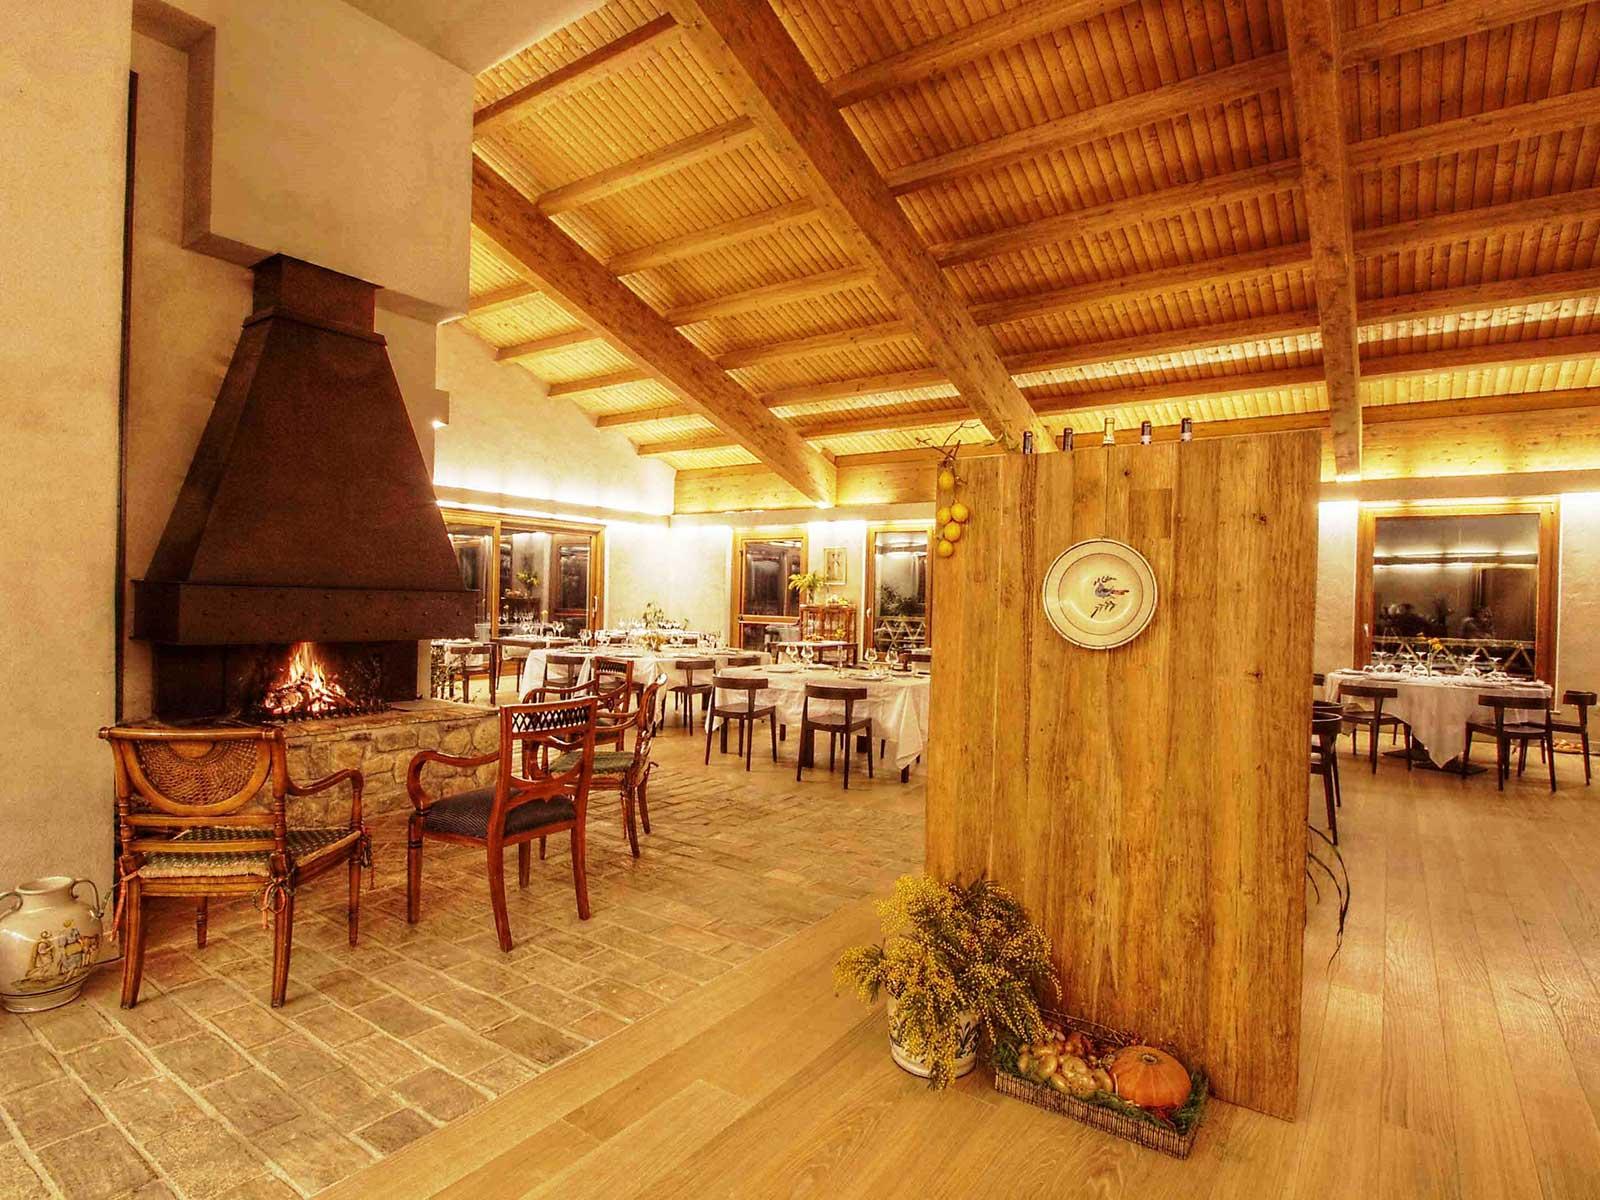 Farmhouse Farmhouse for sale Penne (PE), Casa Cignale - Penne - EUR 0 70